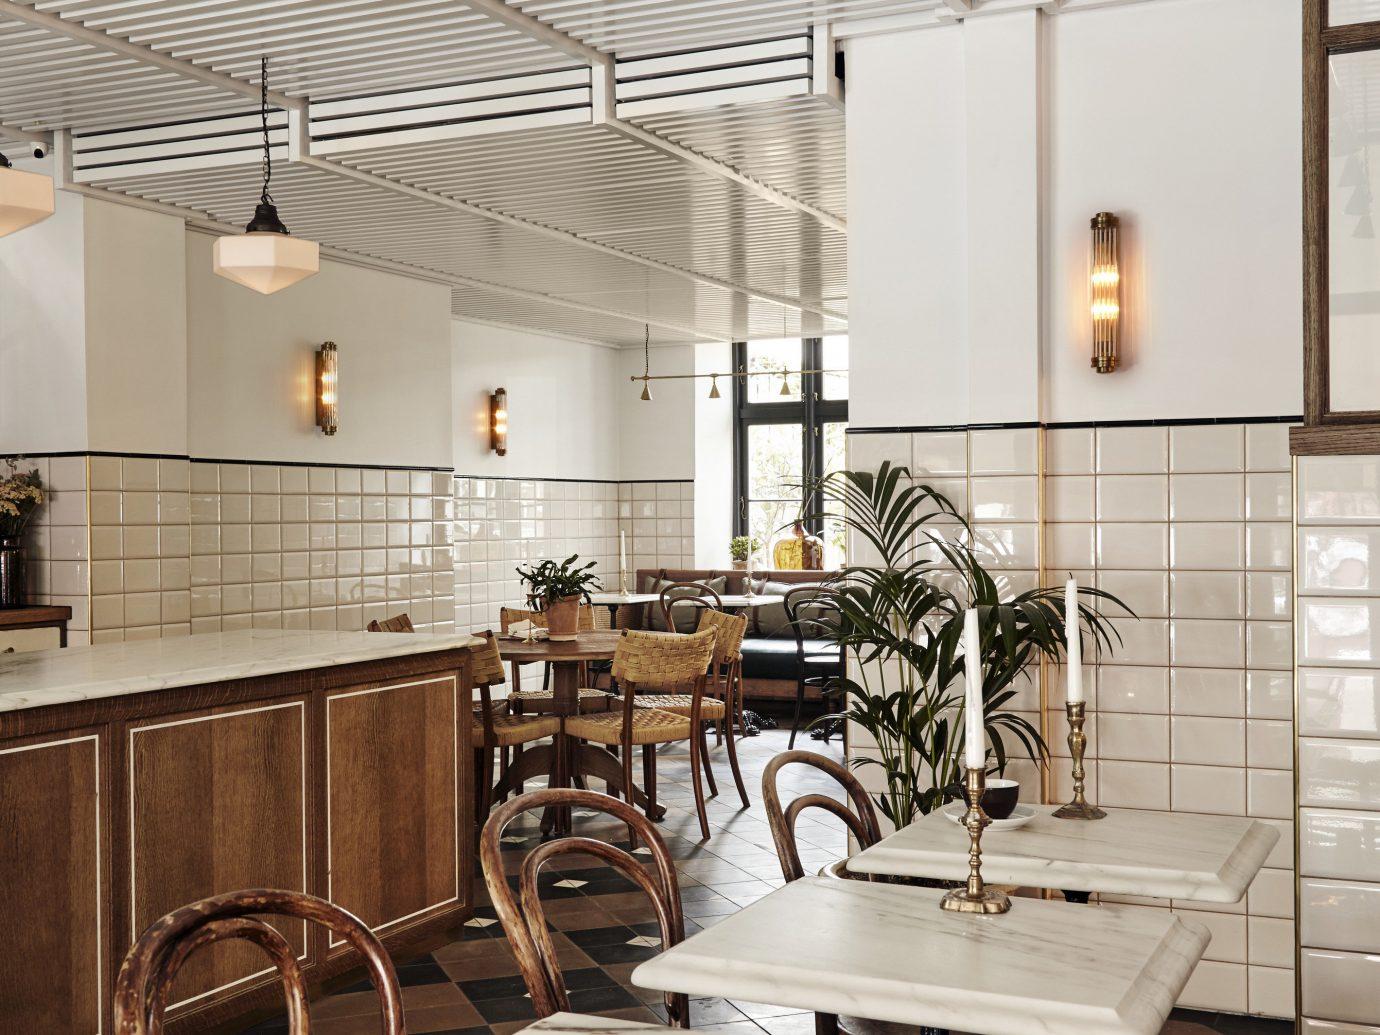 Boutique Hotels Copenhagen Denmark Hotels Trip Ideas indoor interior design Kitchen flooring countertop ceiling tiled